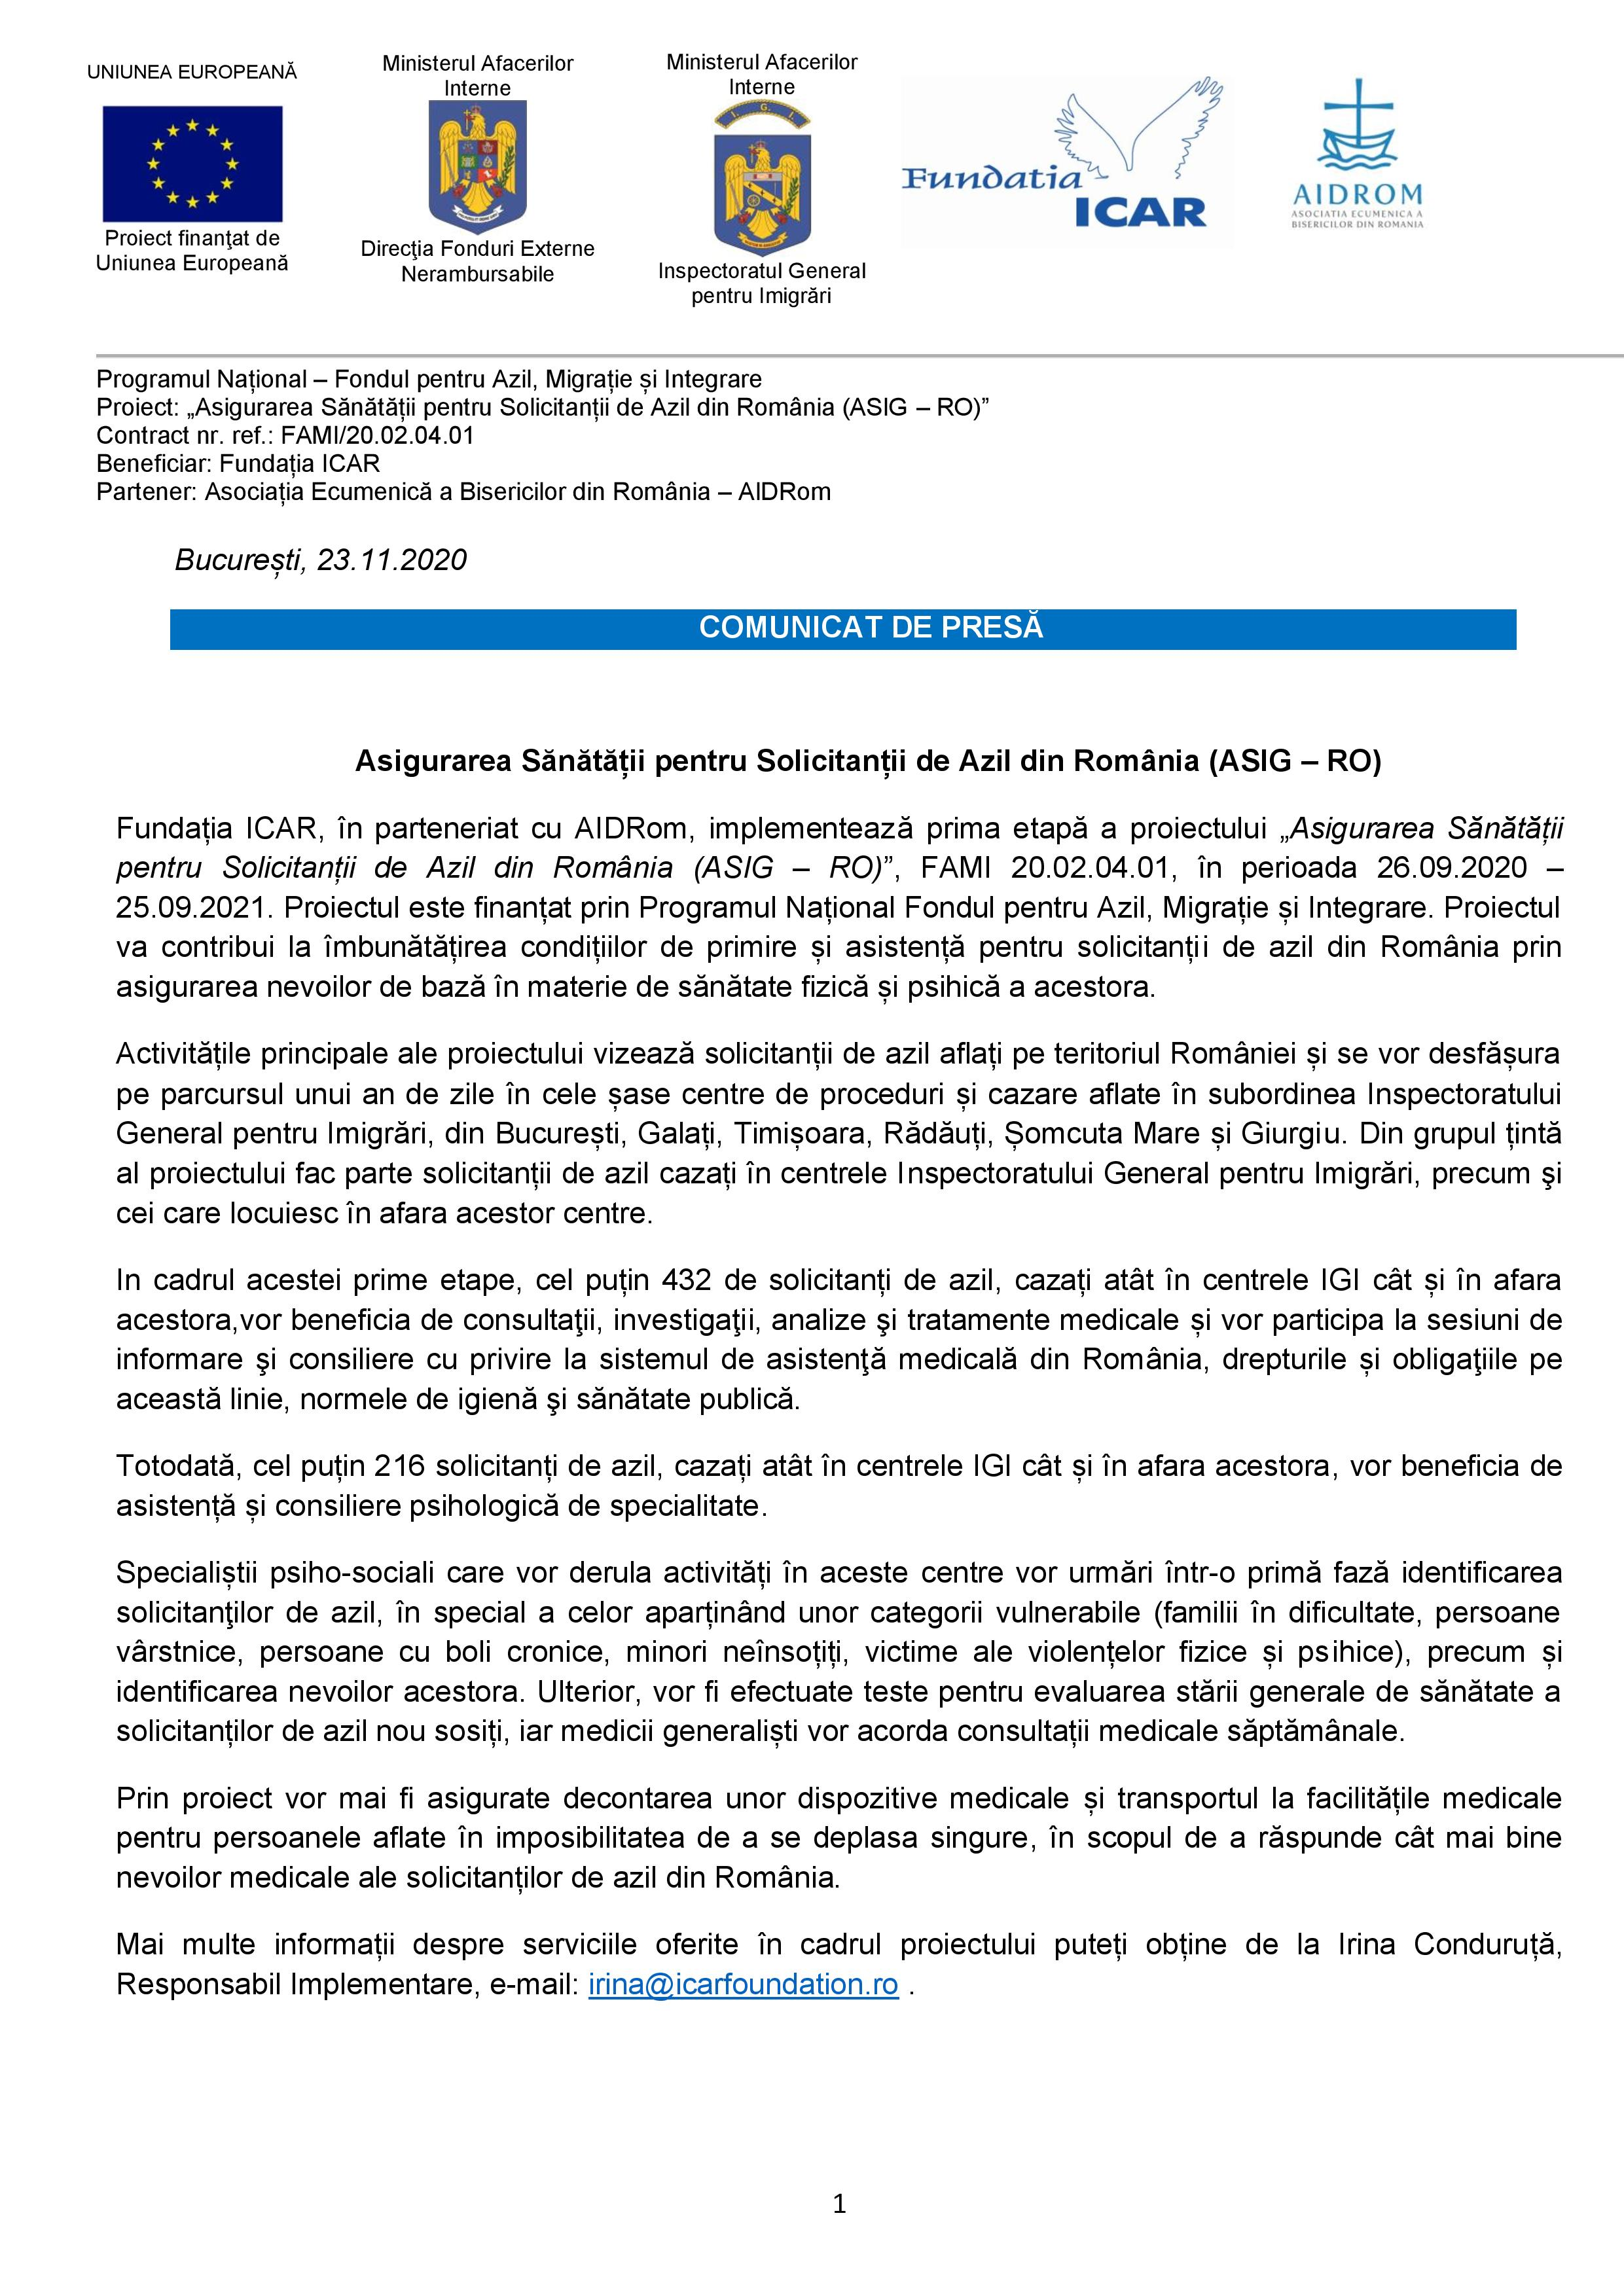 Comunicat_FAMI 20.02.04.01_23.11-page-001